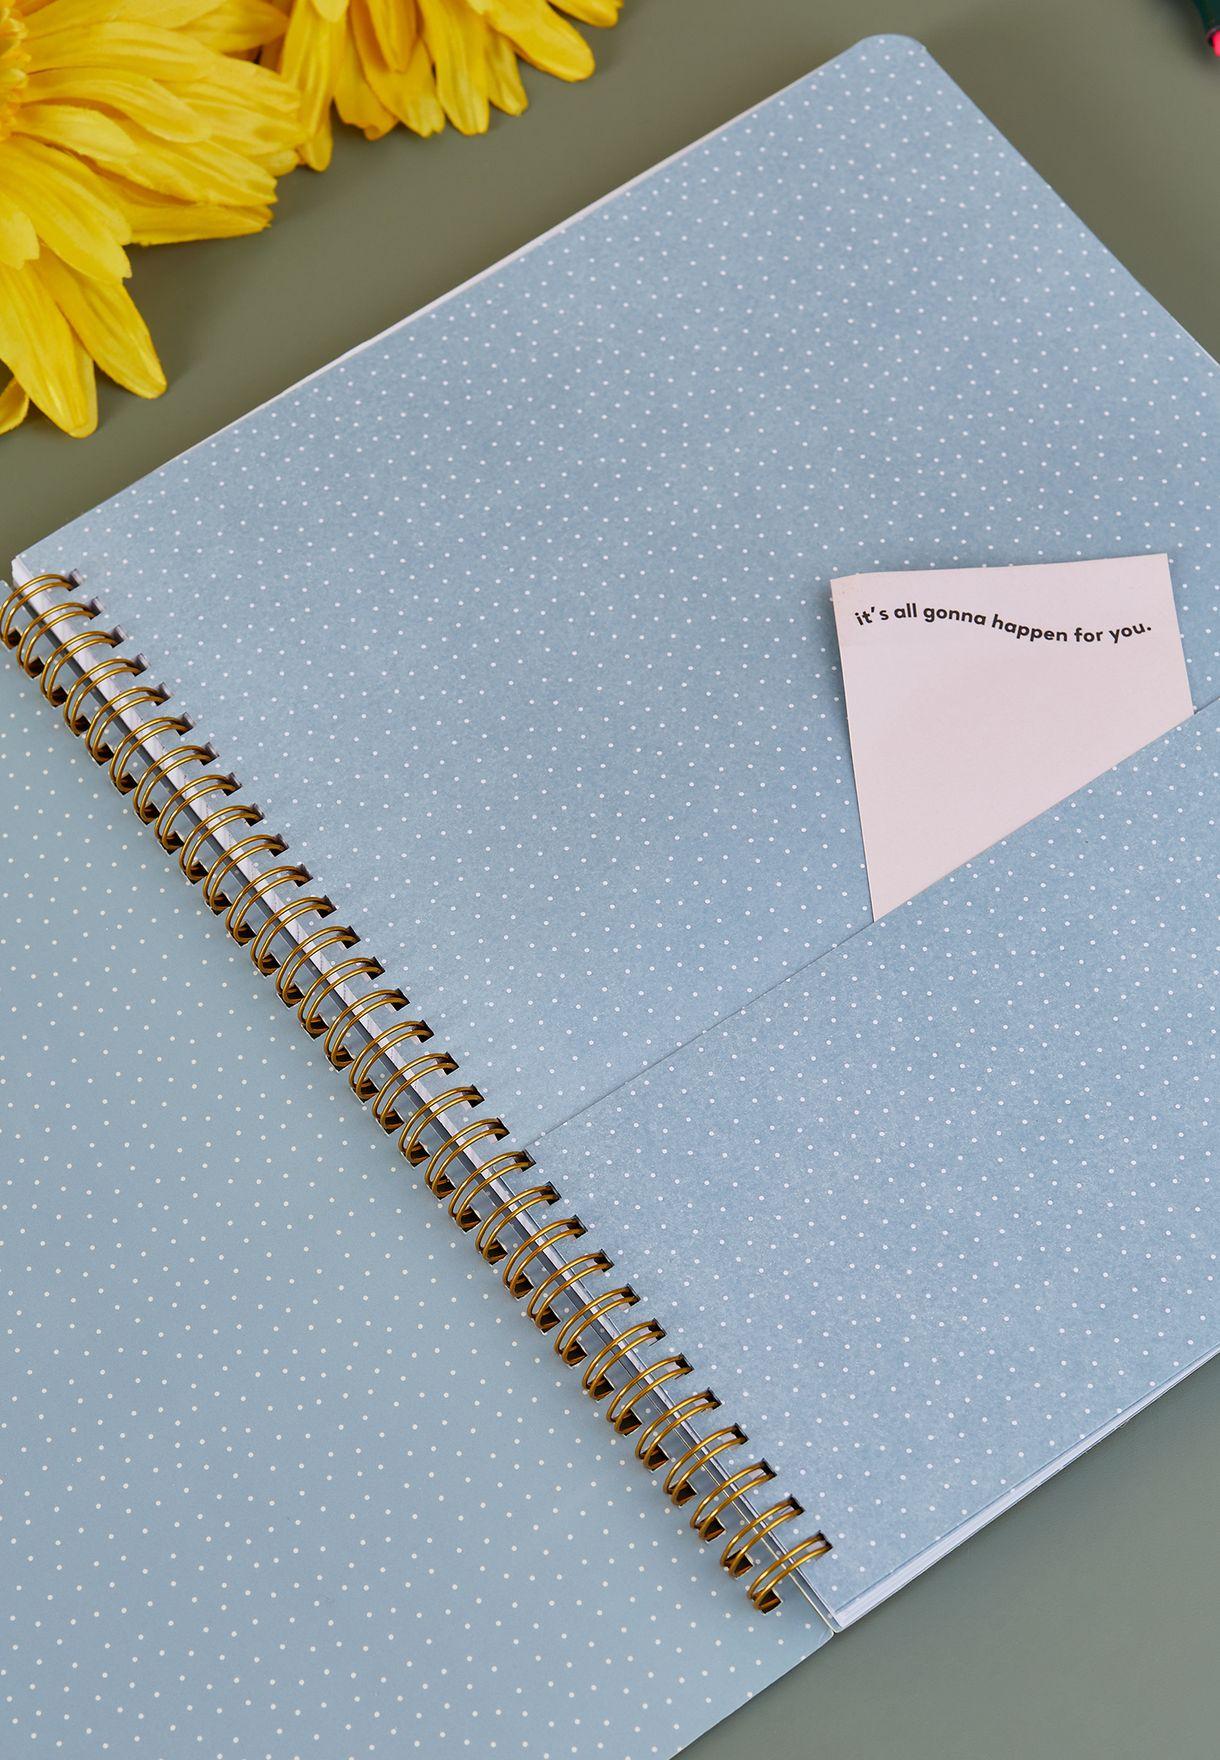 دفتر ملاحظات دوار الشمس A4